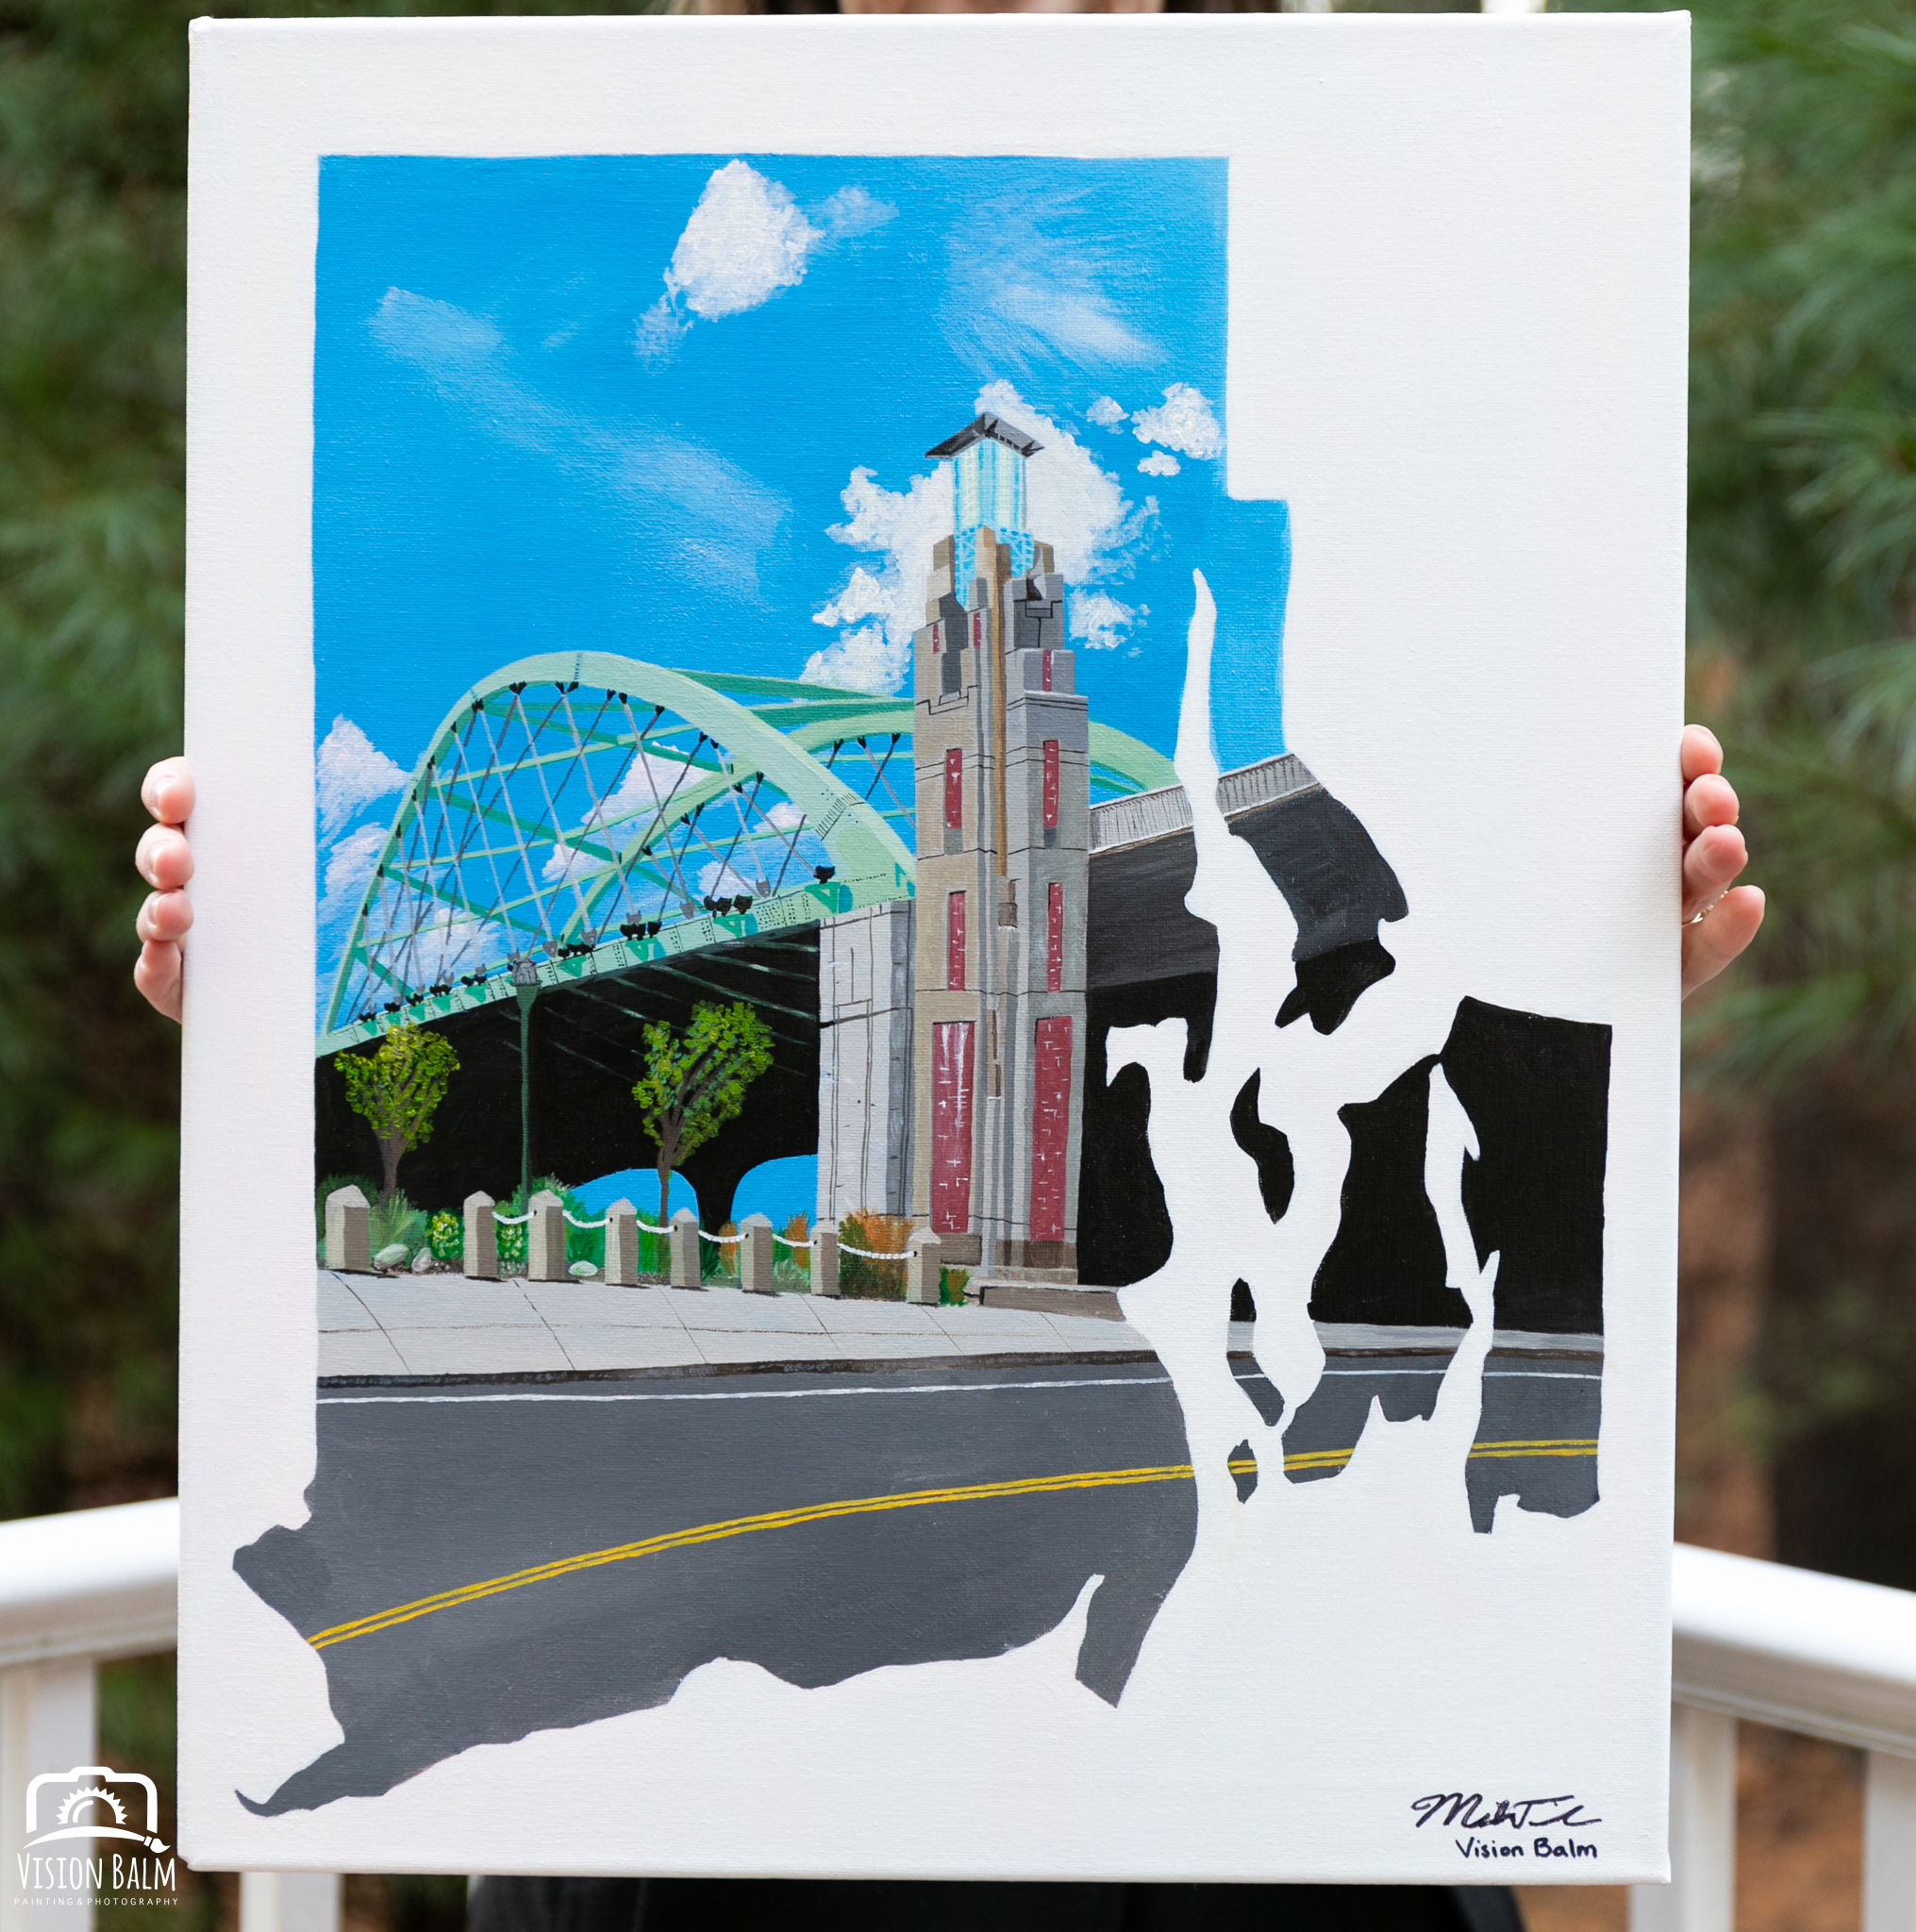 "rhode island - India Point Bridge - Providence, RI16"" x 20"" Acrylic on Canvas"